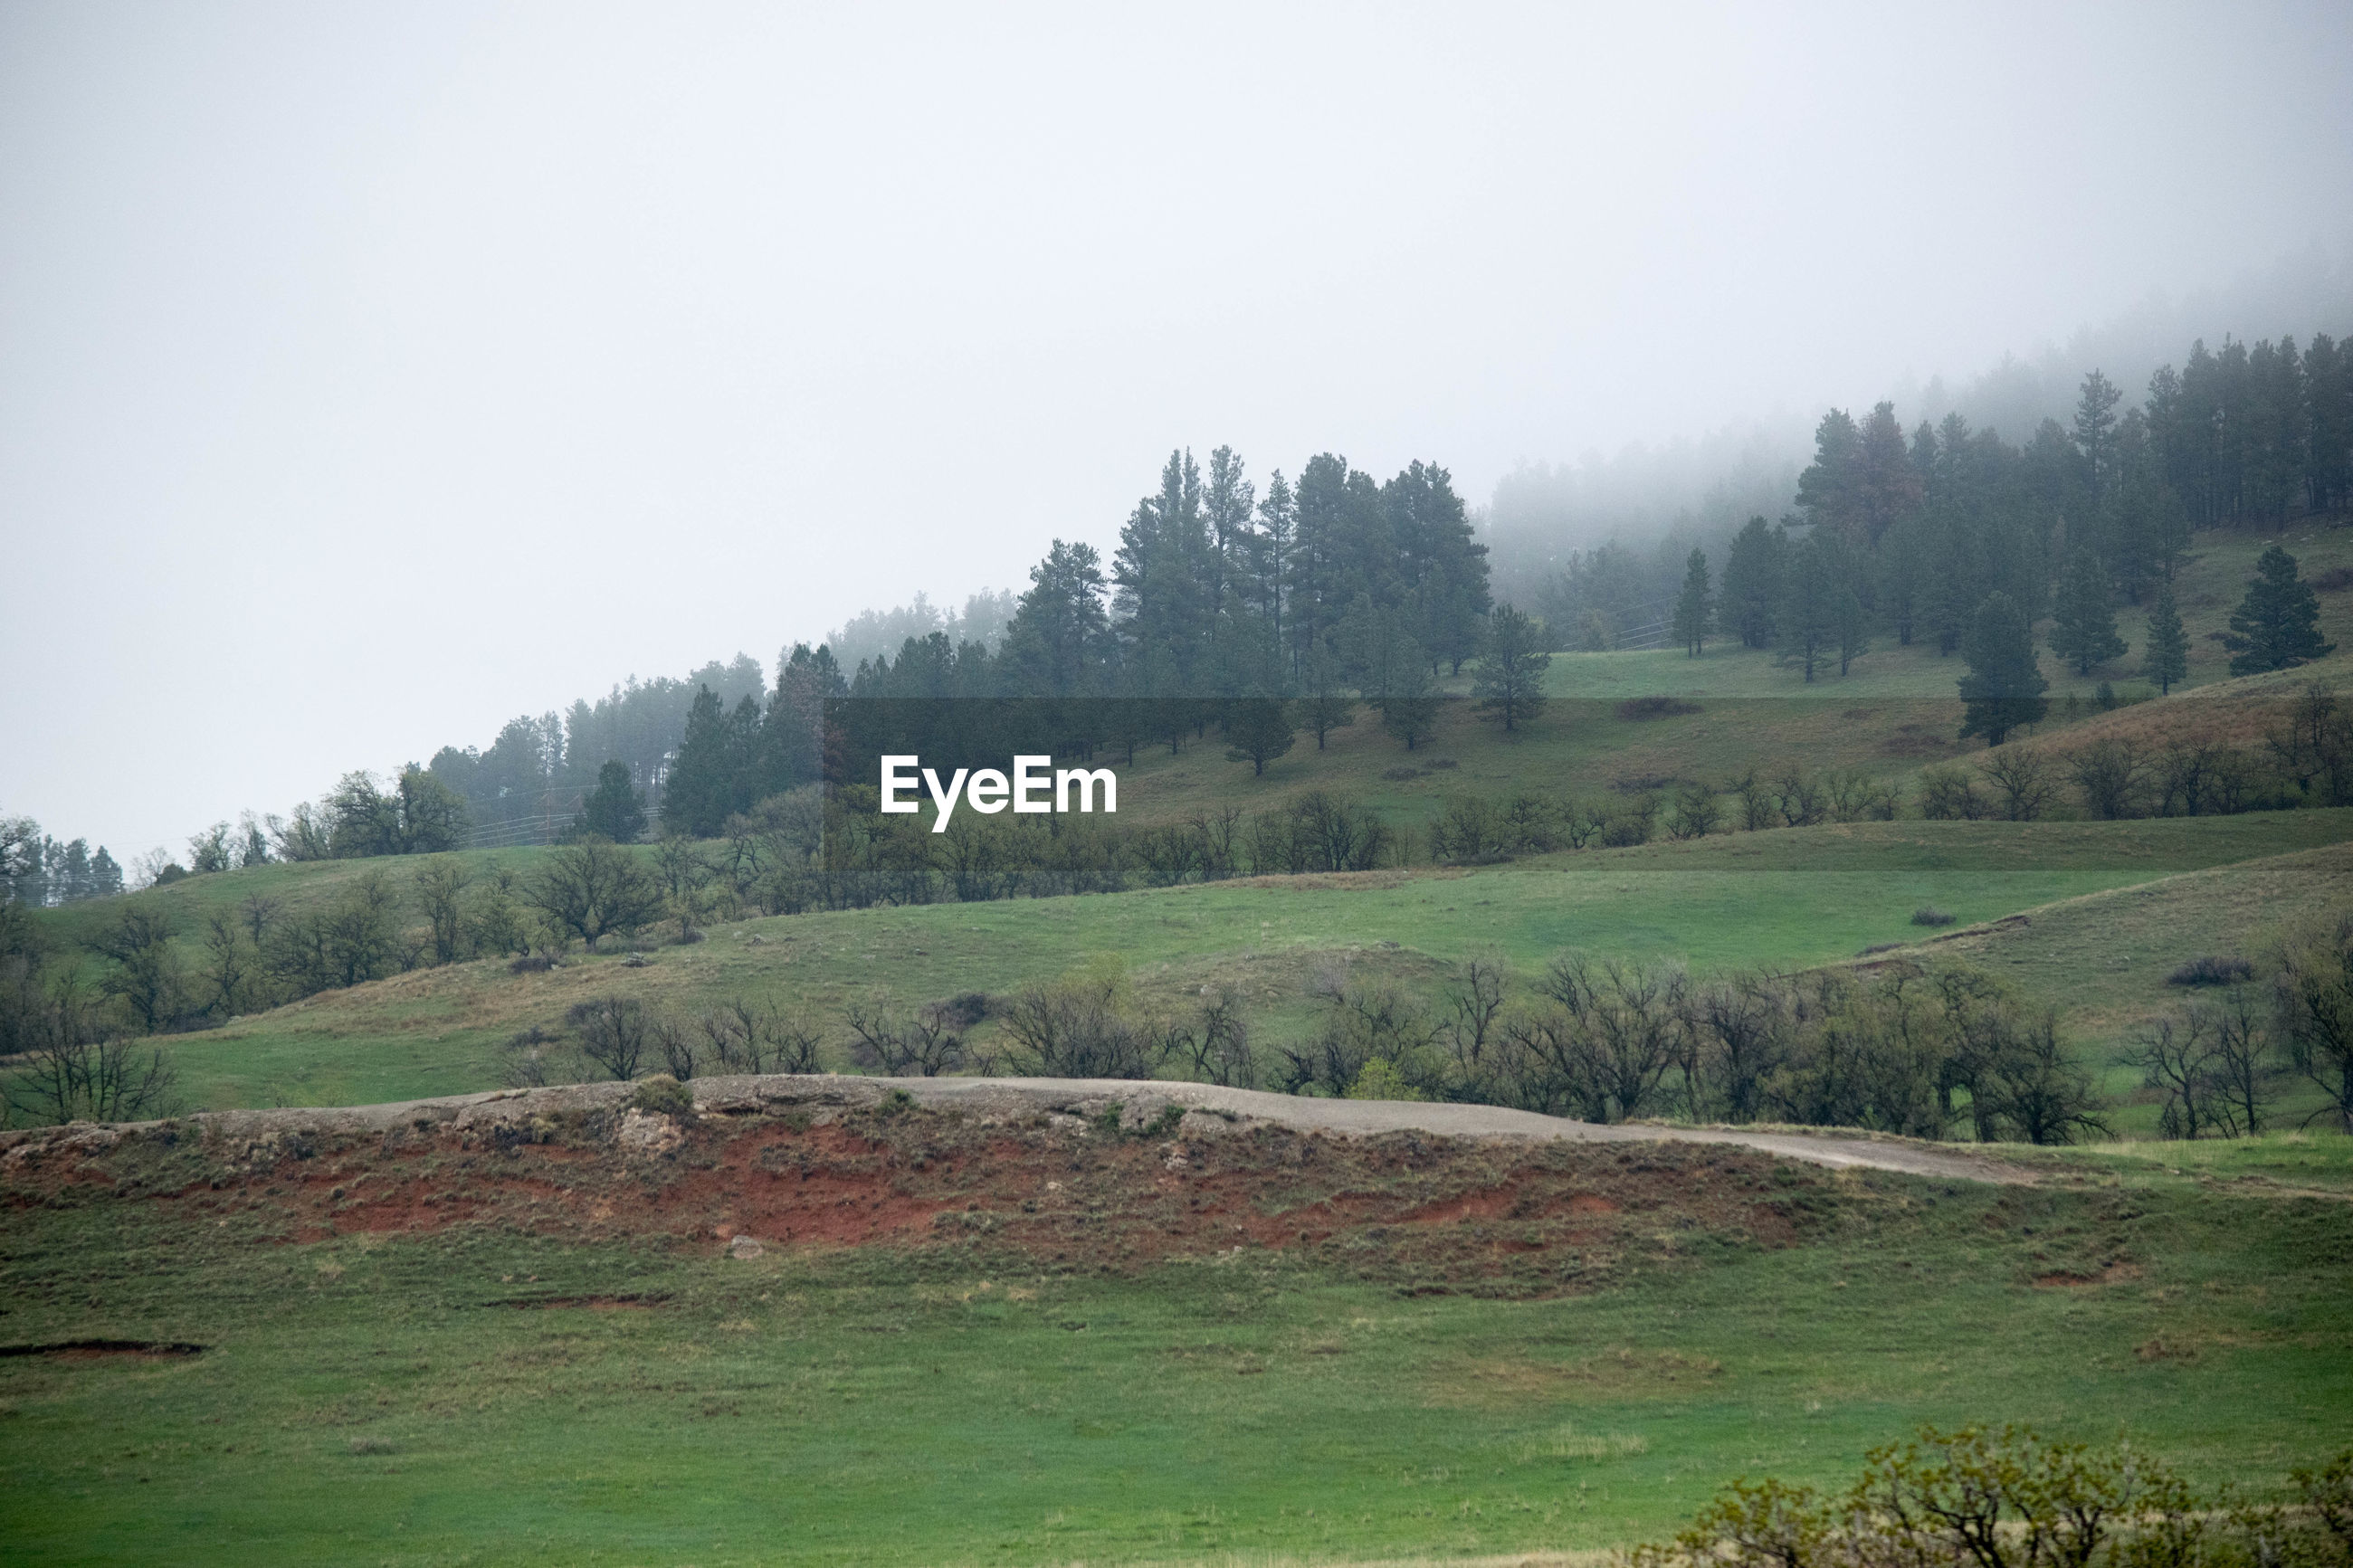 IDYLLIC SHOT OF TREES ON FIELD AGAINST SKY